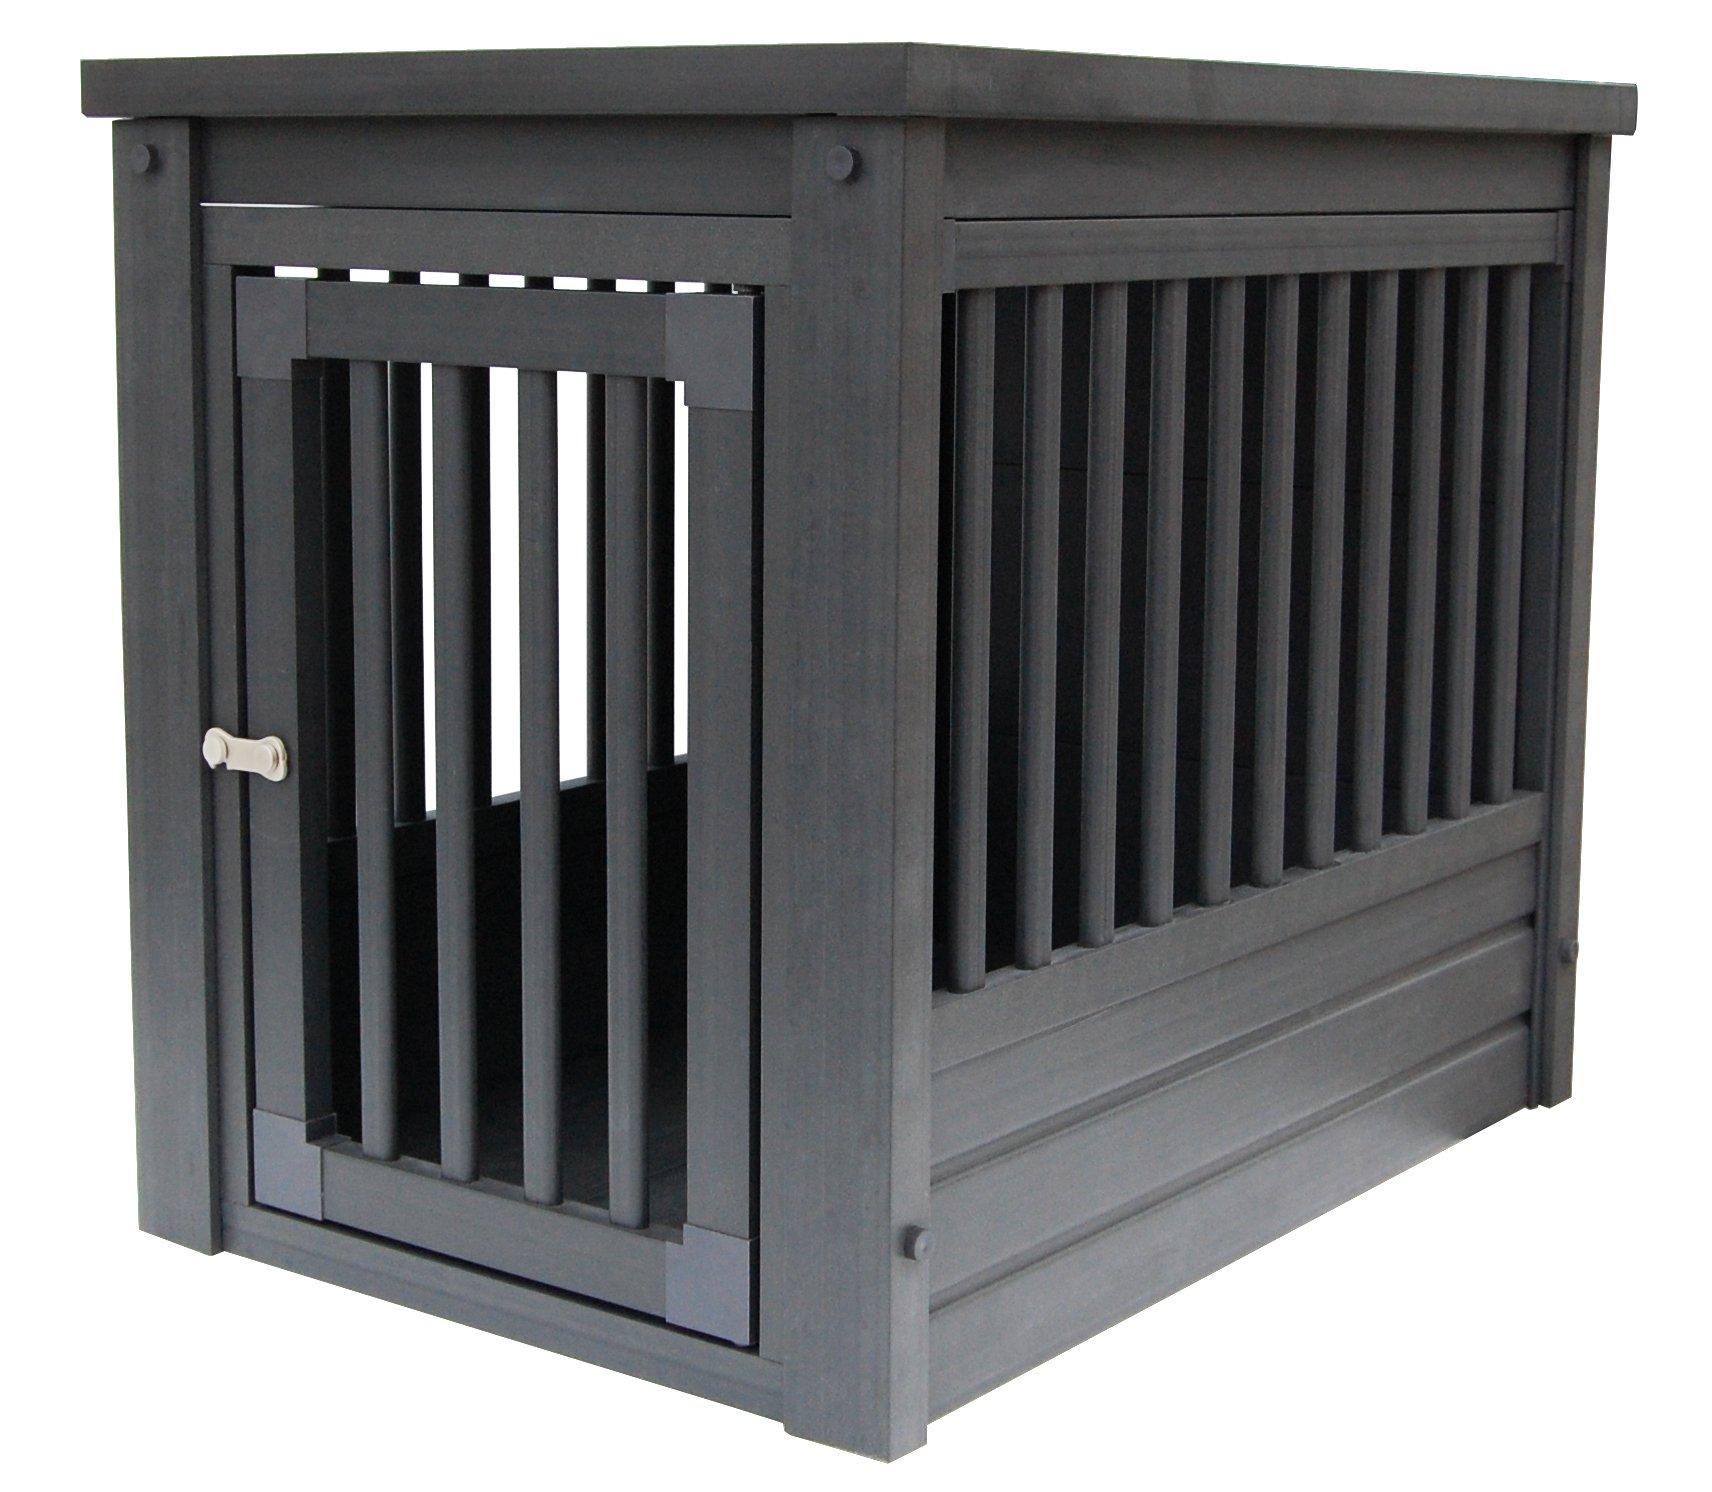 New Age Pet Habitat 'n Home InnPlace Crate/Table, Medium